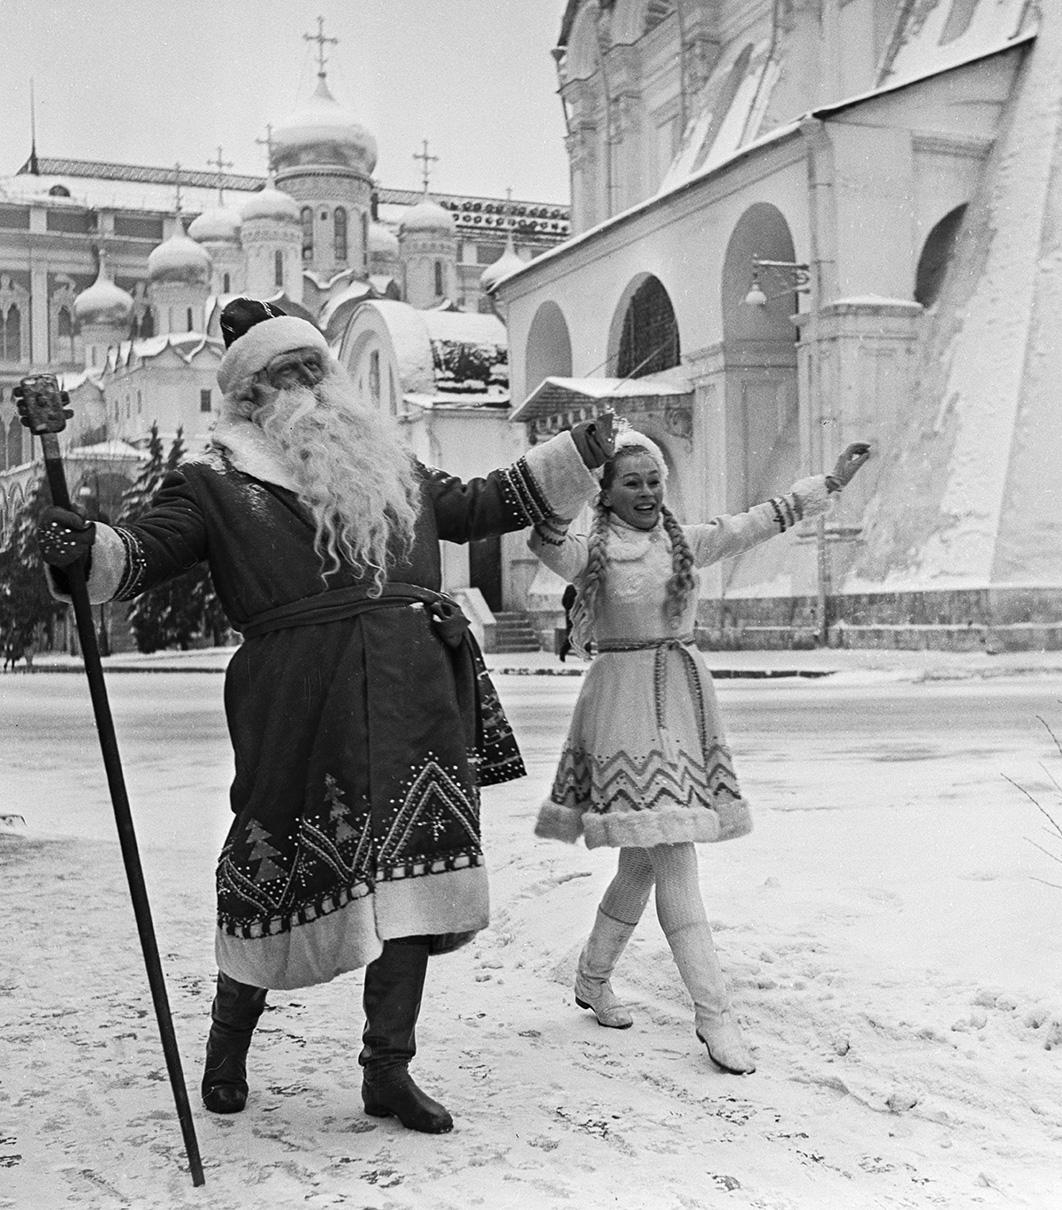 Дед Мороз и Снегурочка на улицах столицы. 1968 год